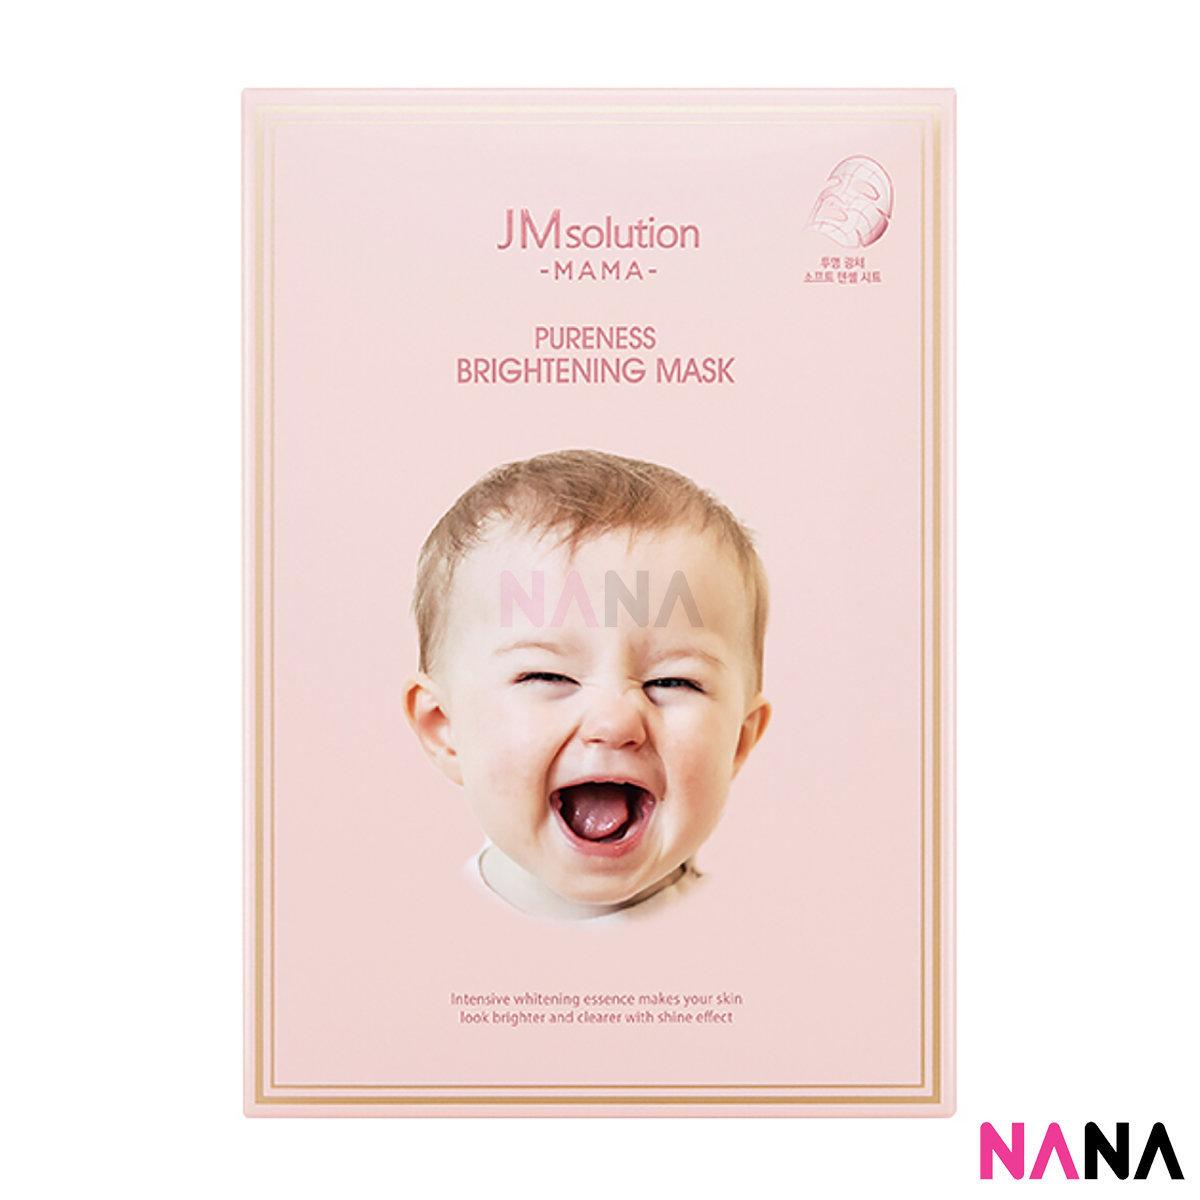 MAMA Pureness Brightening Mask (10 Sheets/ Box)